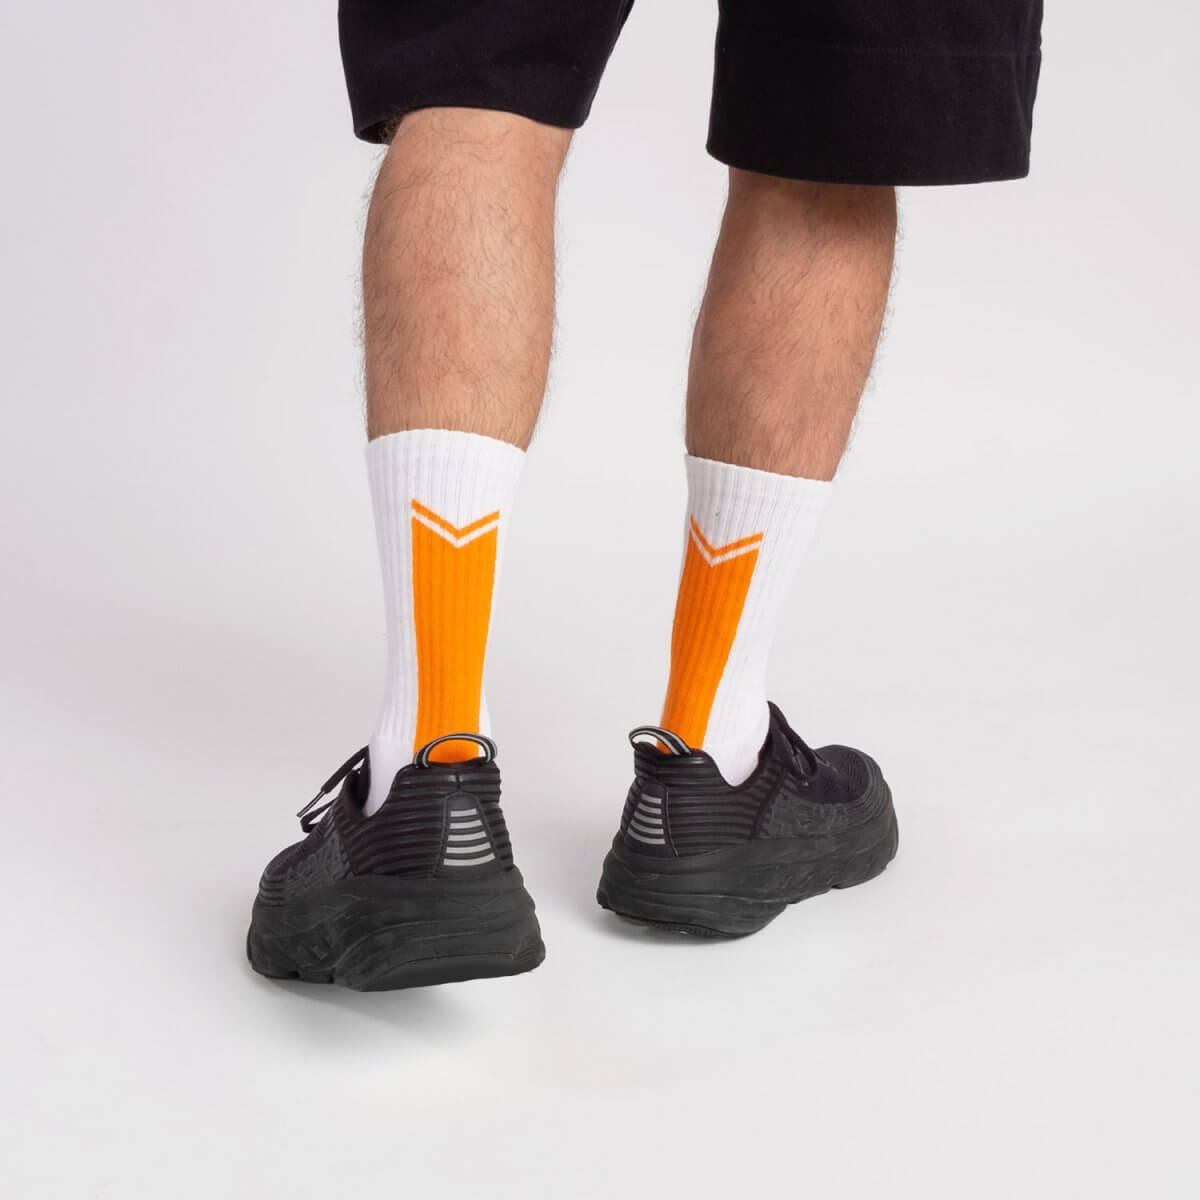 calze-fluo-arancioni-fabbrica-posteriore